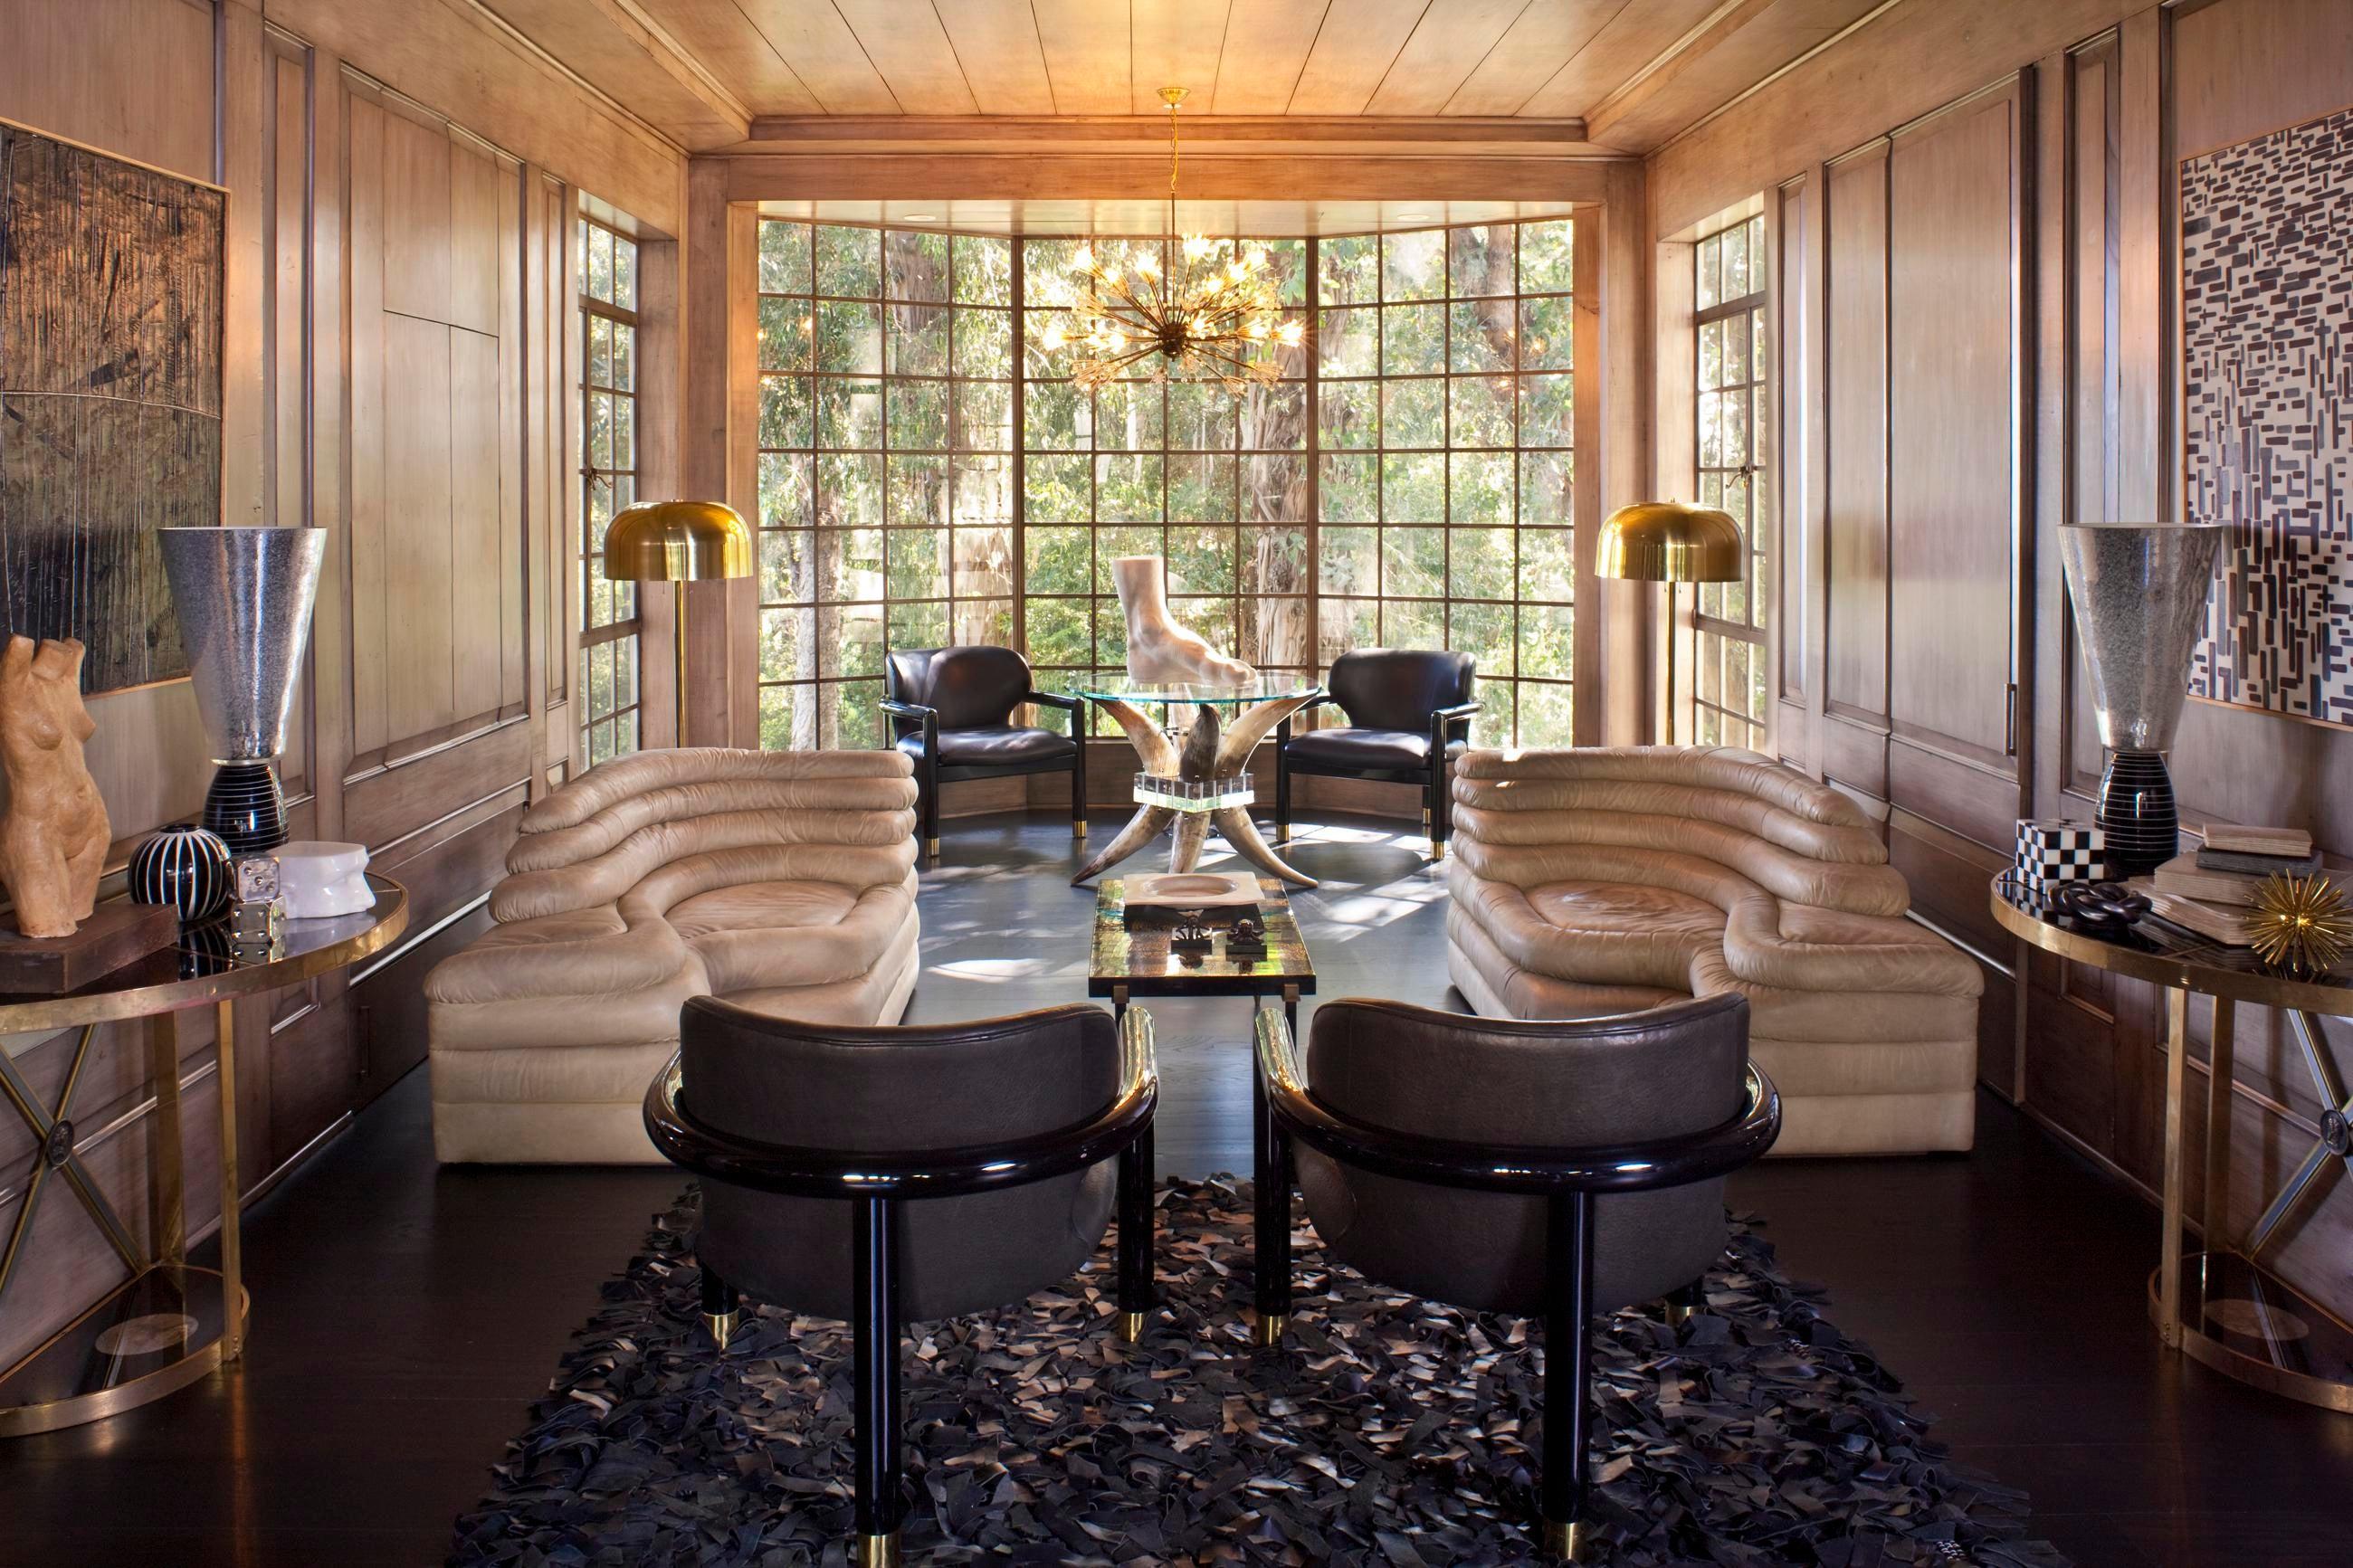 Kelly.wearstler.9291.portfolio.interiors.living.1501103934.8868618